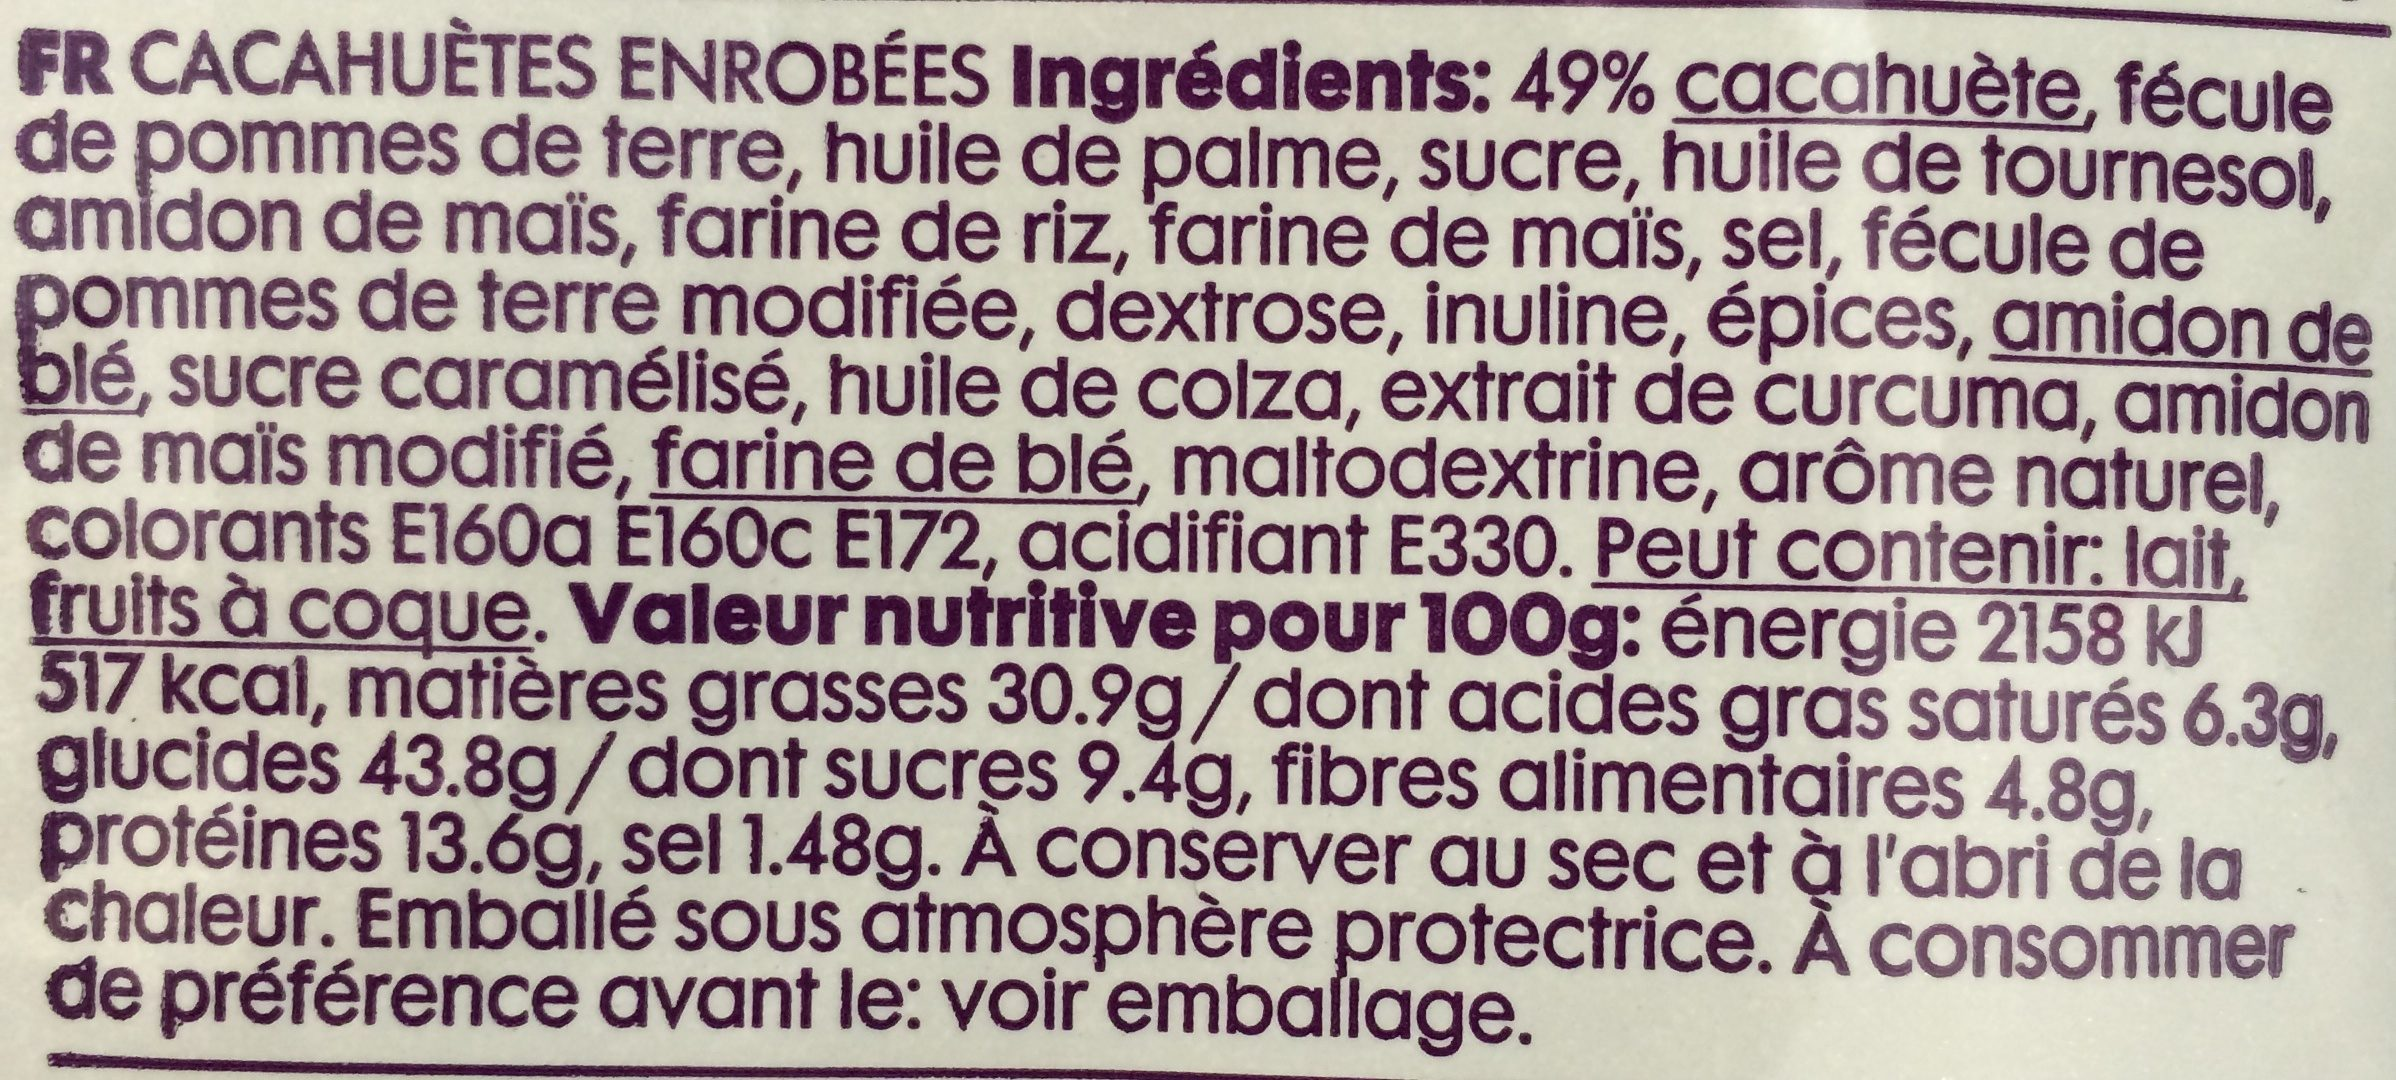 Cacahuètes enrobées - Ingrediënten